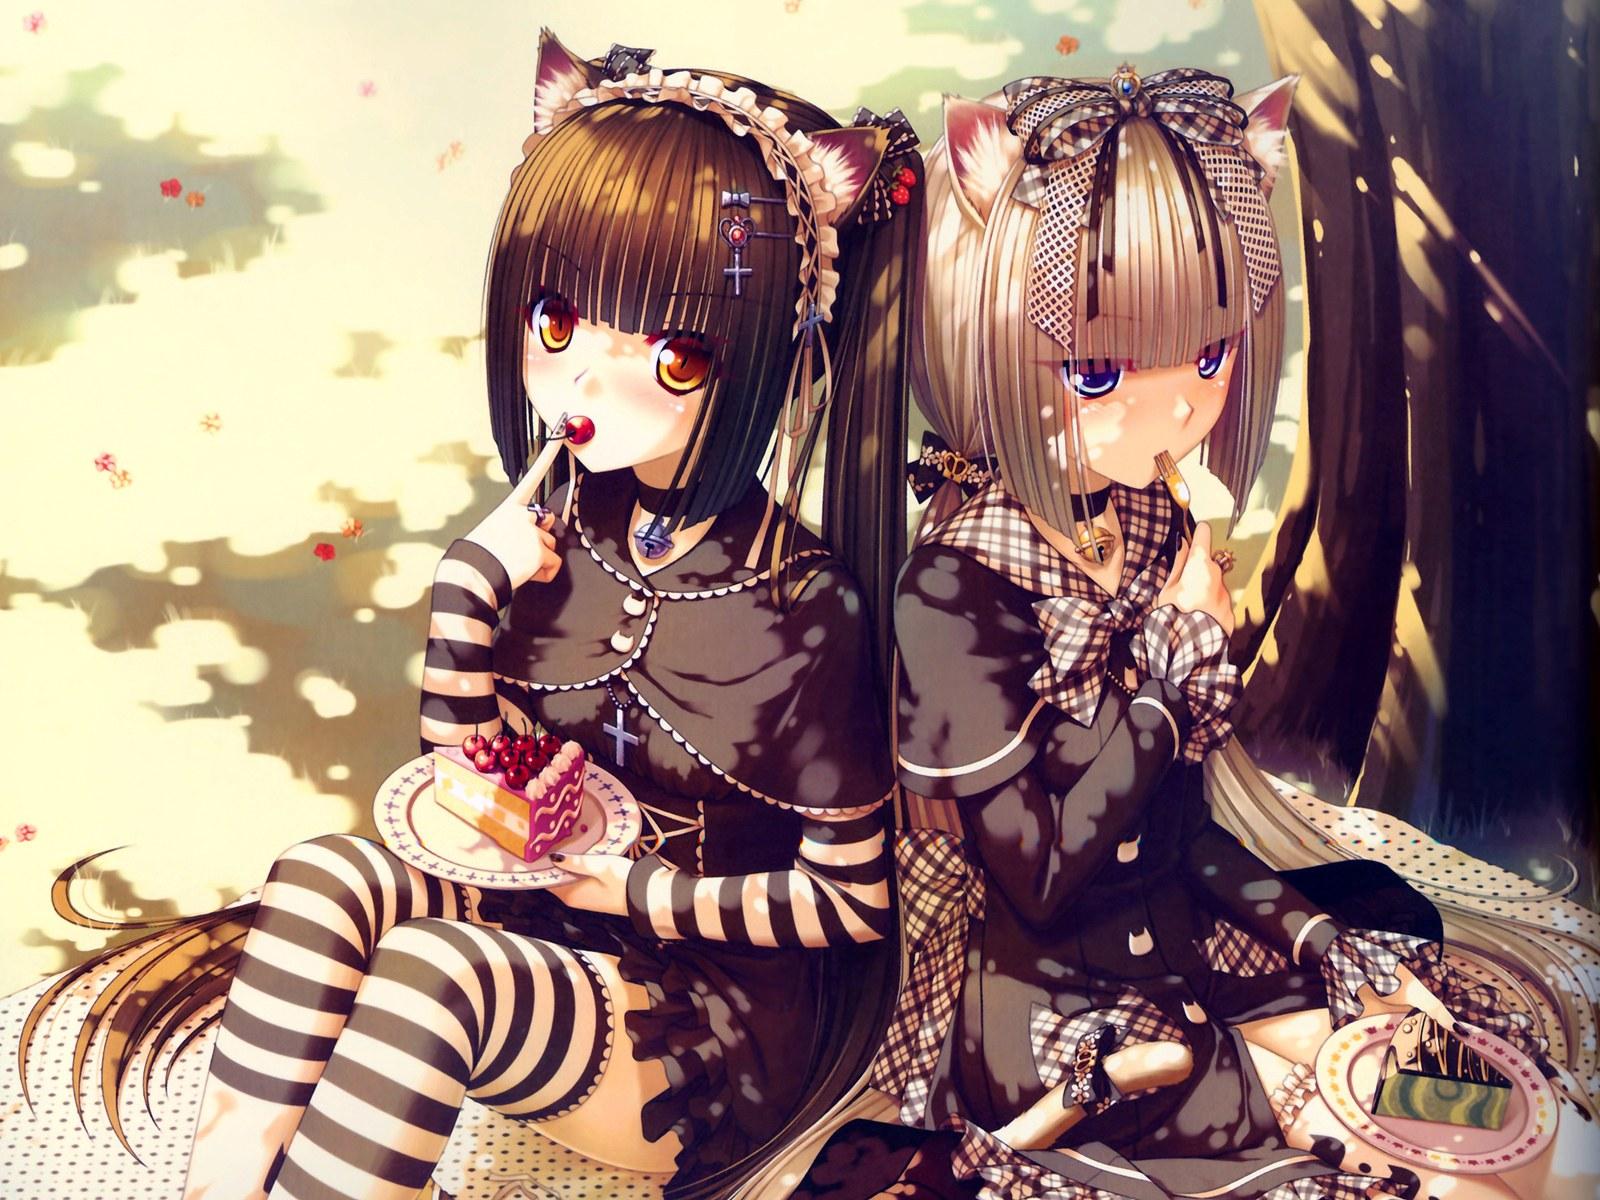 18 Wonderful HD Anime Girls Wallpapers